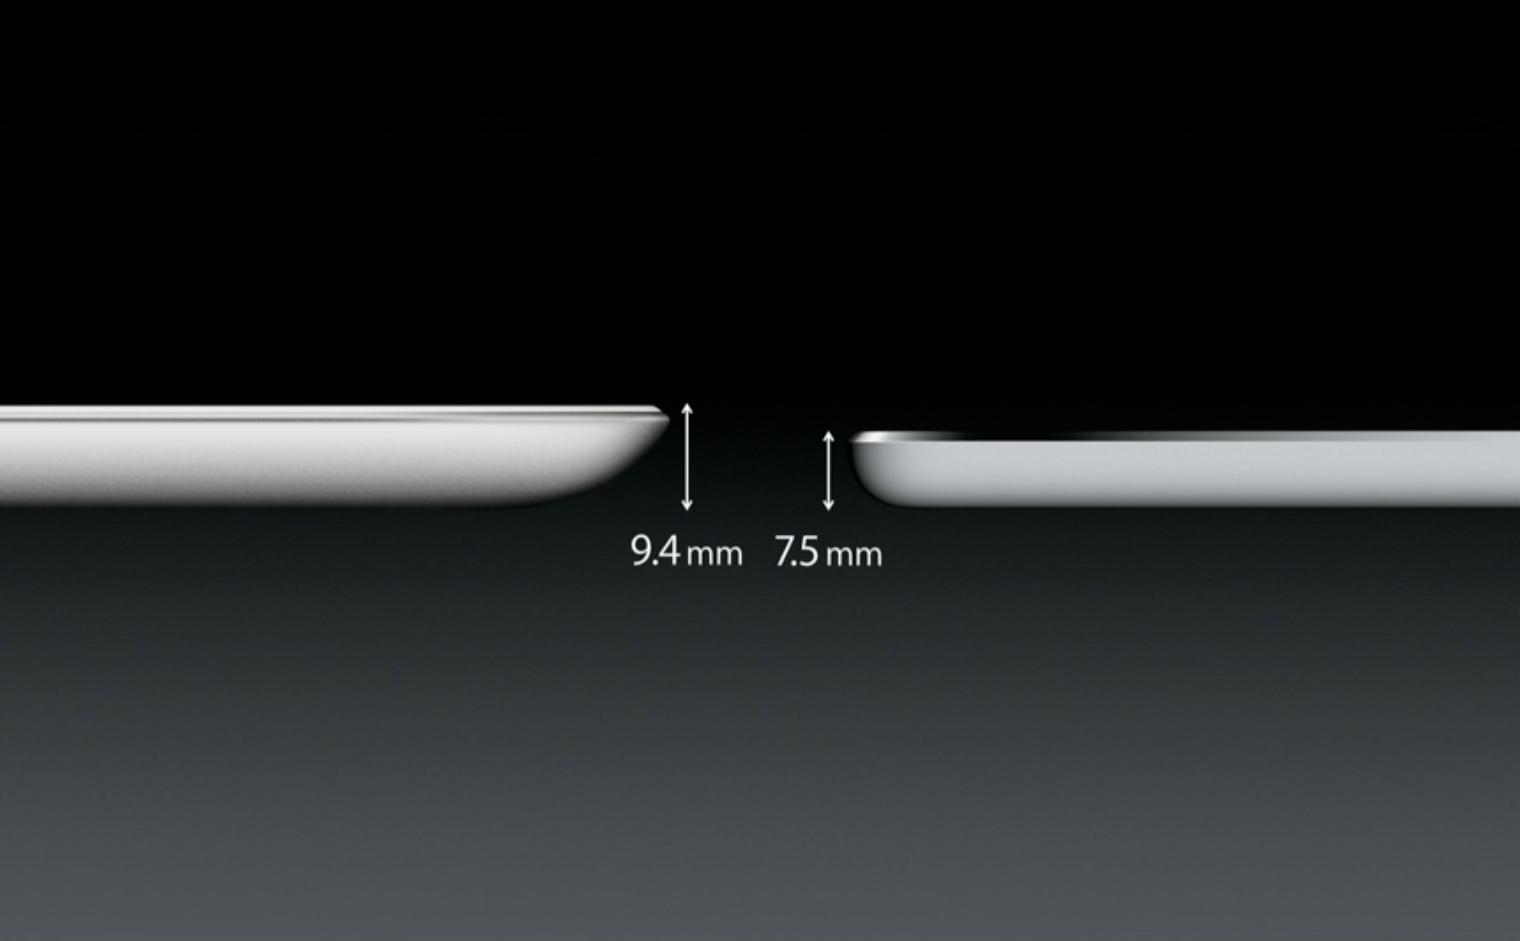 ipad thickness